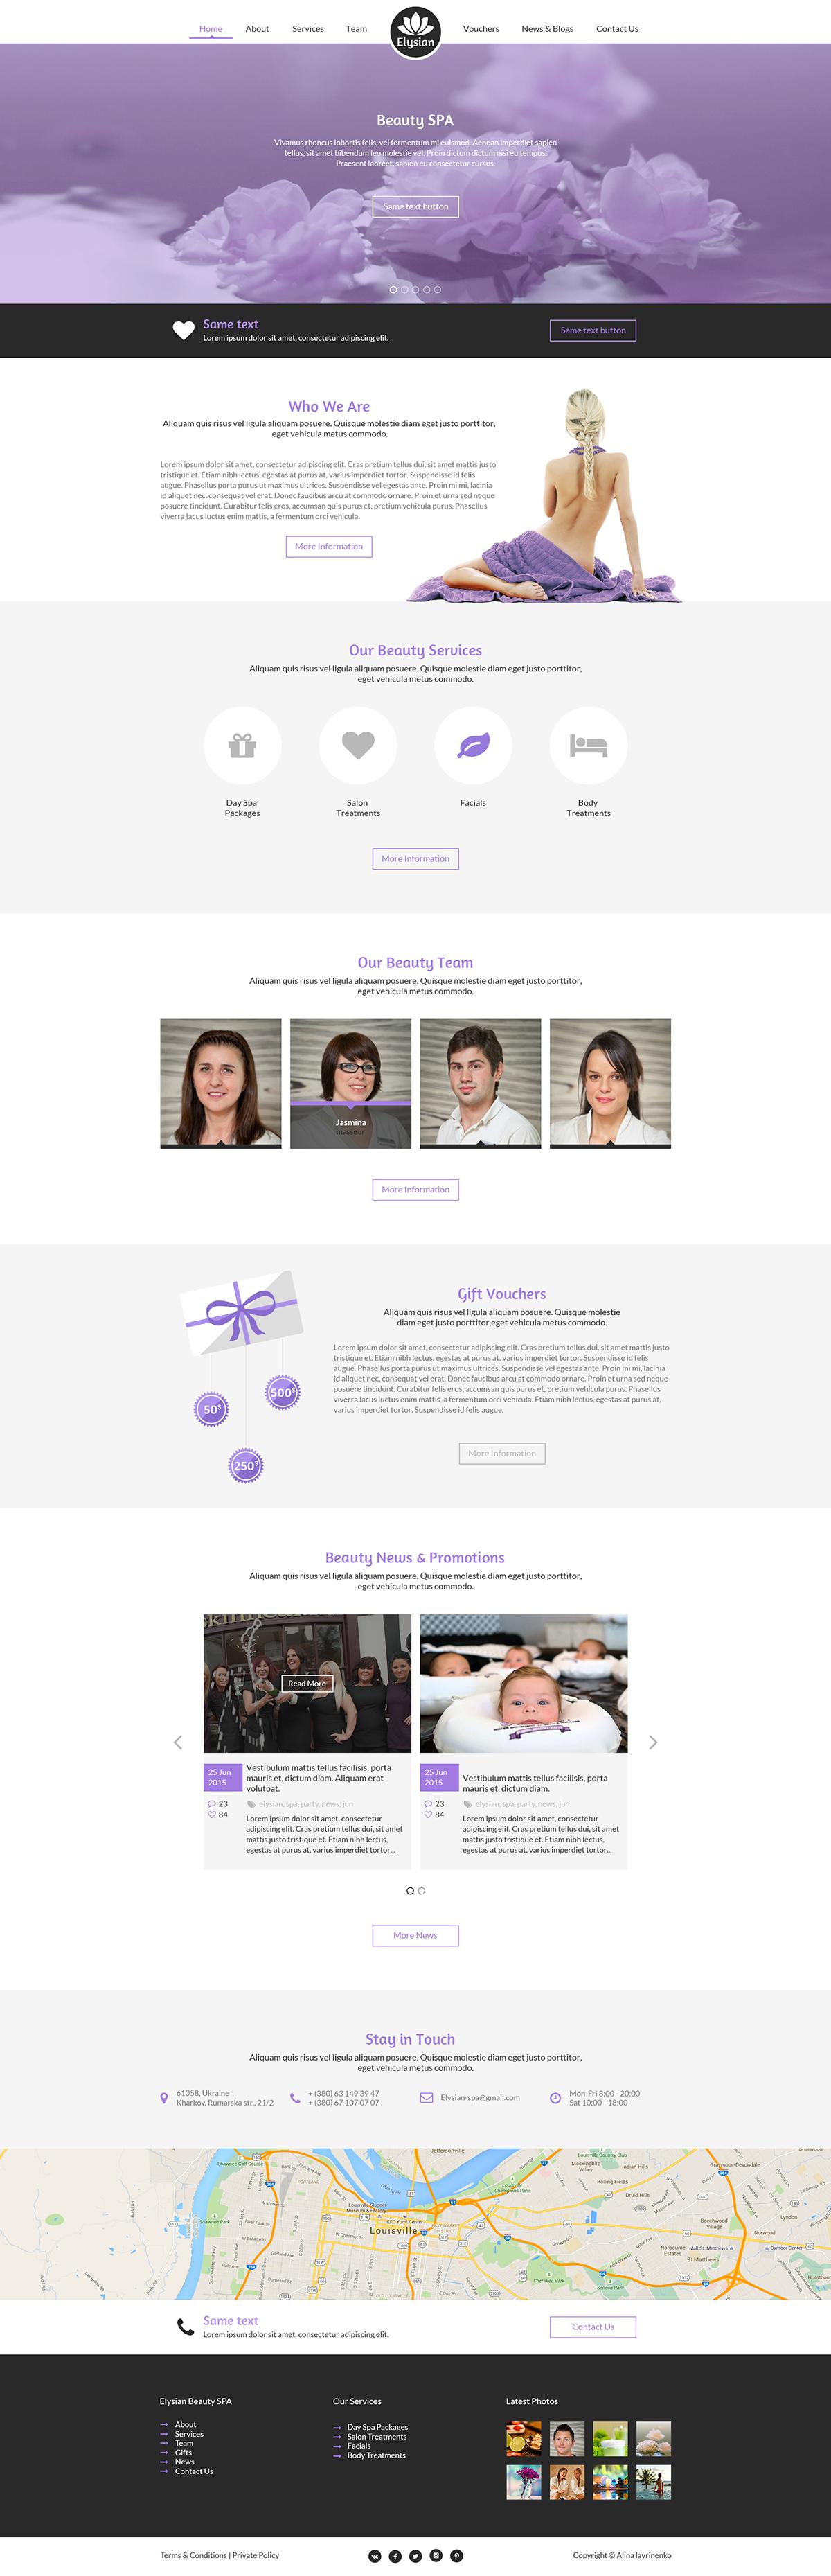 design homepage Lanfing Page beauty spa spa saloon elysian